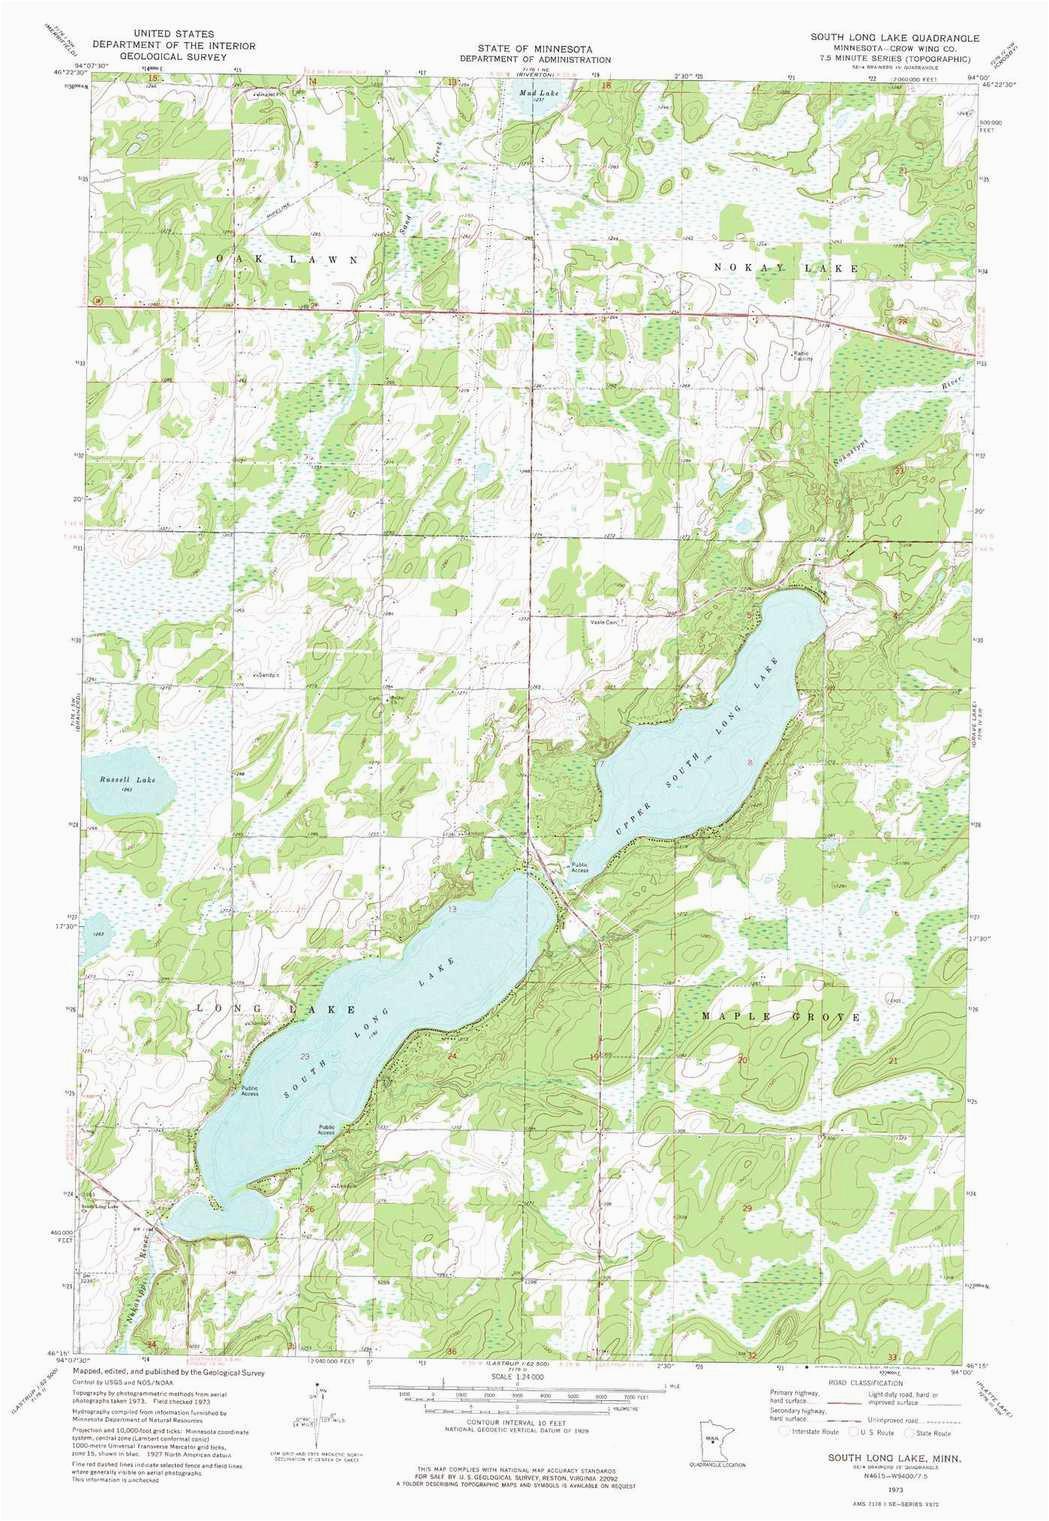 Minnesota Lake Contour Maps | secretmuseum on map of central minnesota, map of mountain lake mn, map mn minnesota state maps, cass lake depth maps mn, map of red lake minnesota, map of lake superior north shore, map of leech lake mn, map of north shore minnesota, map of lake elmo mn, lake alexander mn, lake crystal mn, map of lake hanska mn, gull lake chain mn, map of big sandy lake mcgregor mn, map of lake park mn, map of southern minnesota, minnesota map minnetonka mn, map minnesota mall of america, map of minnesota savage mn, map of lakes in minnesota,